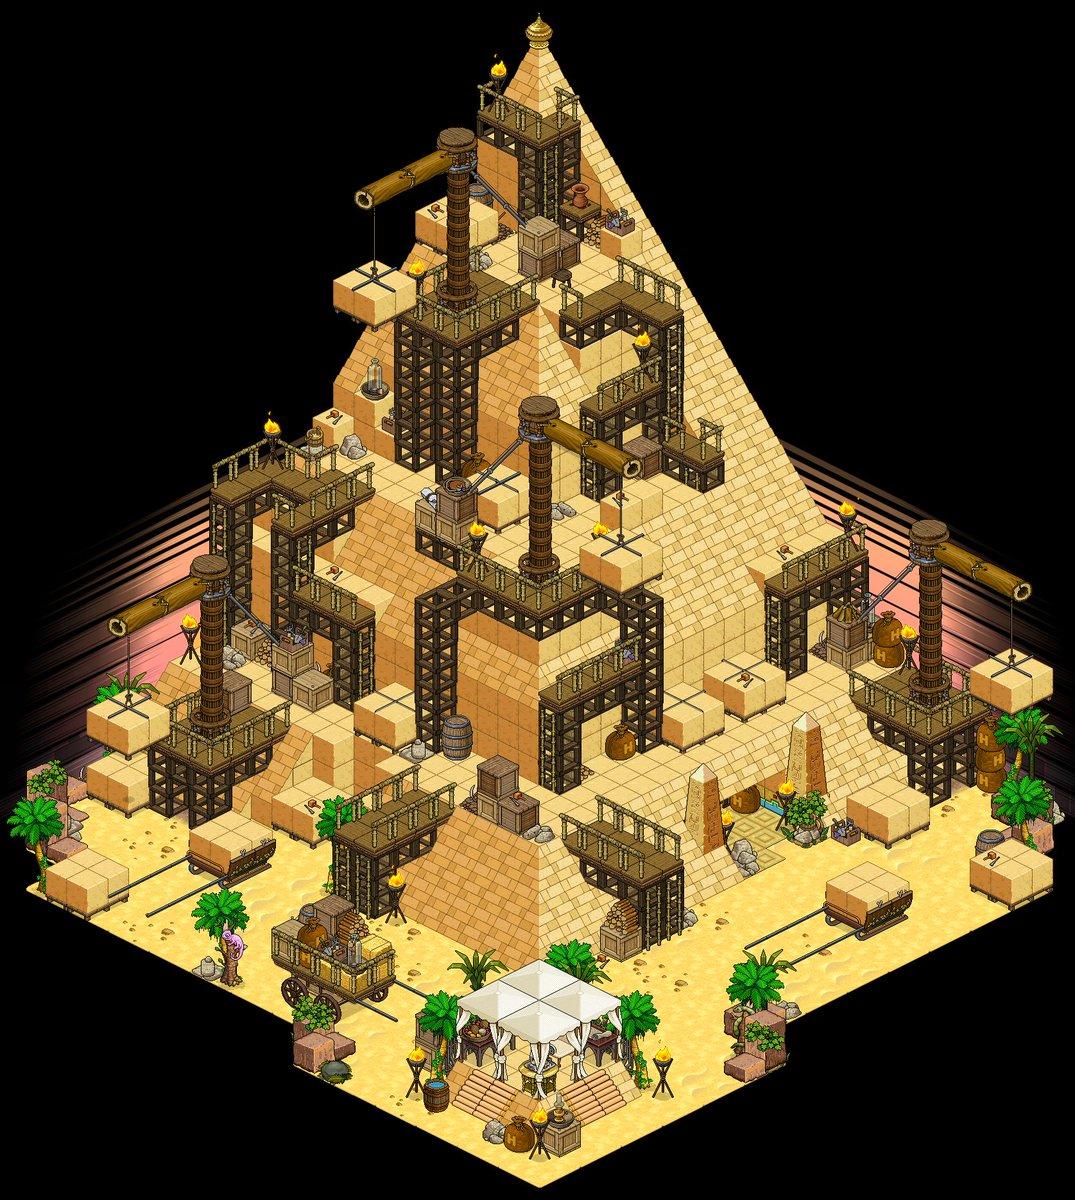 Alphadesign On Twitter Pyramid Buildside C Createhabbo Weebznl